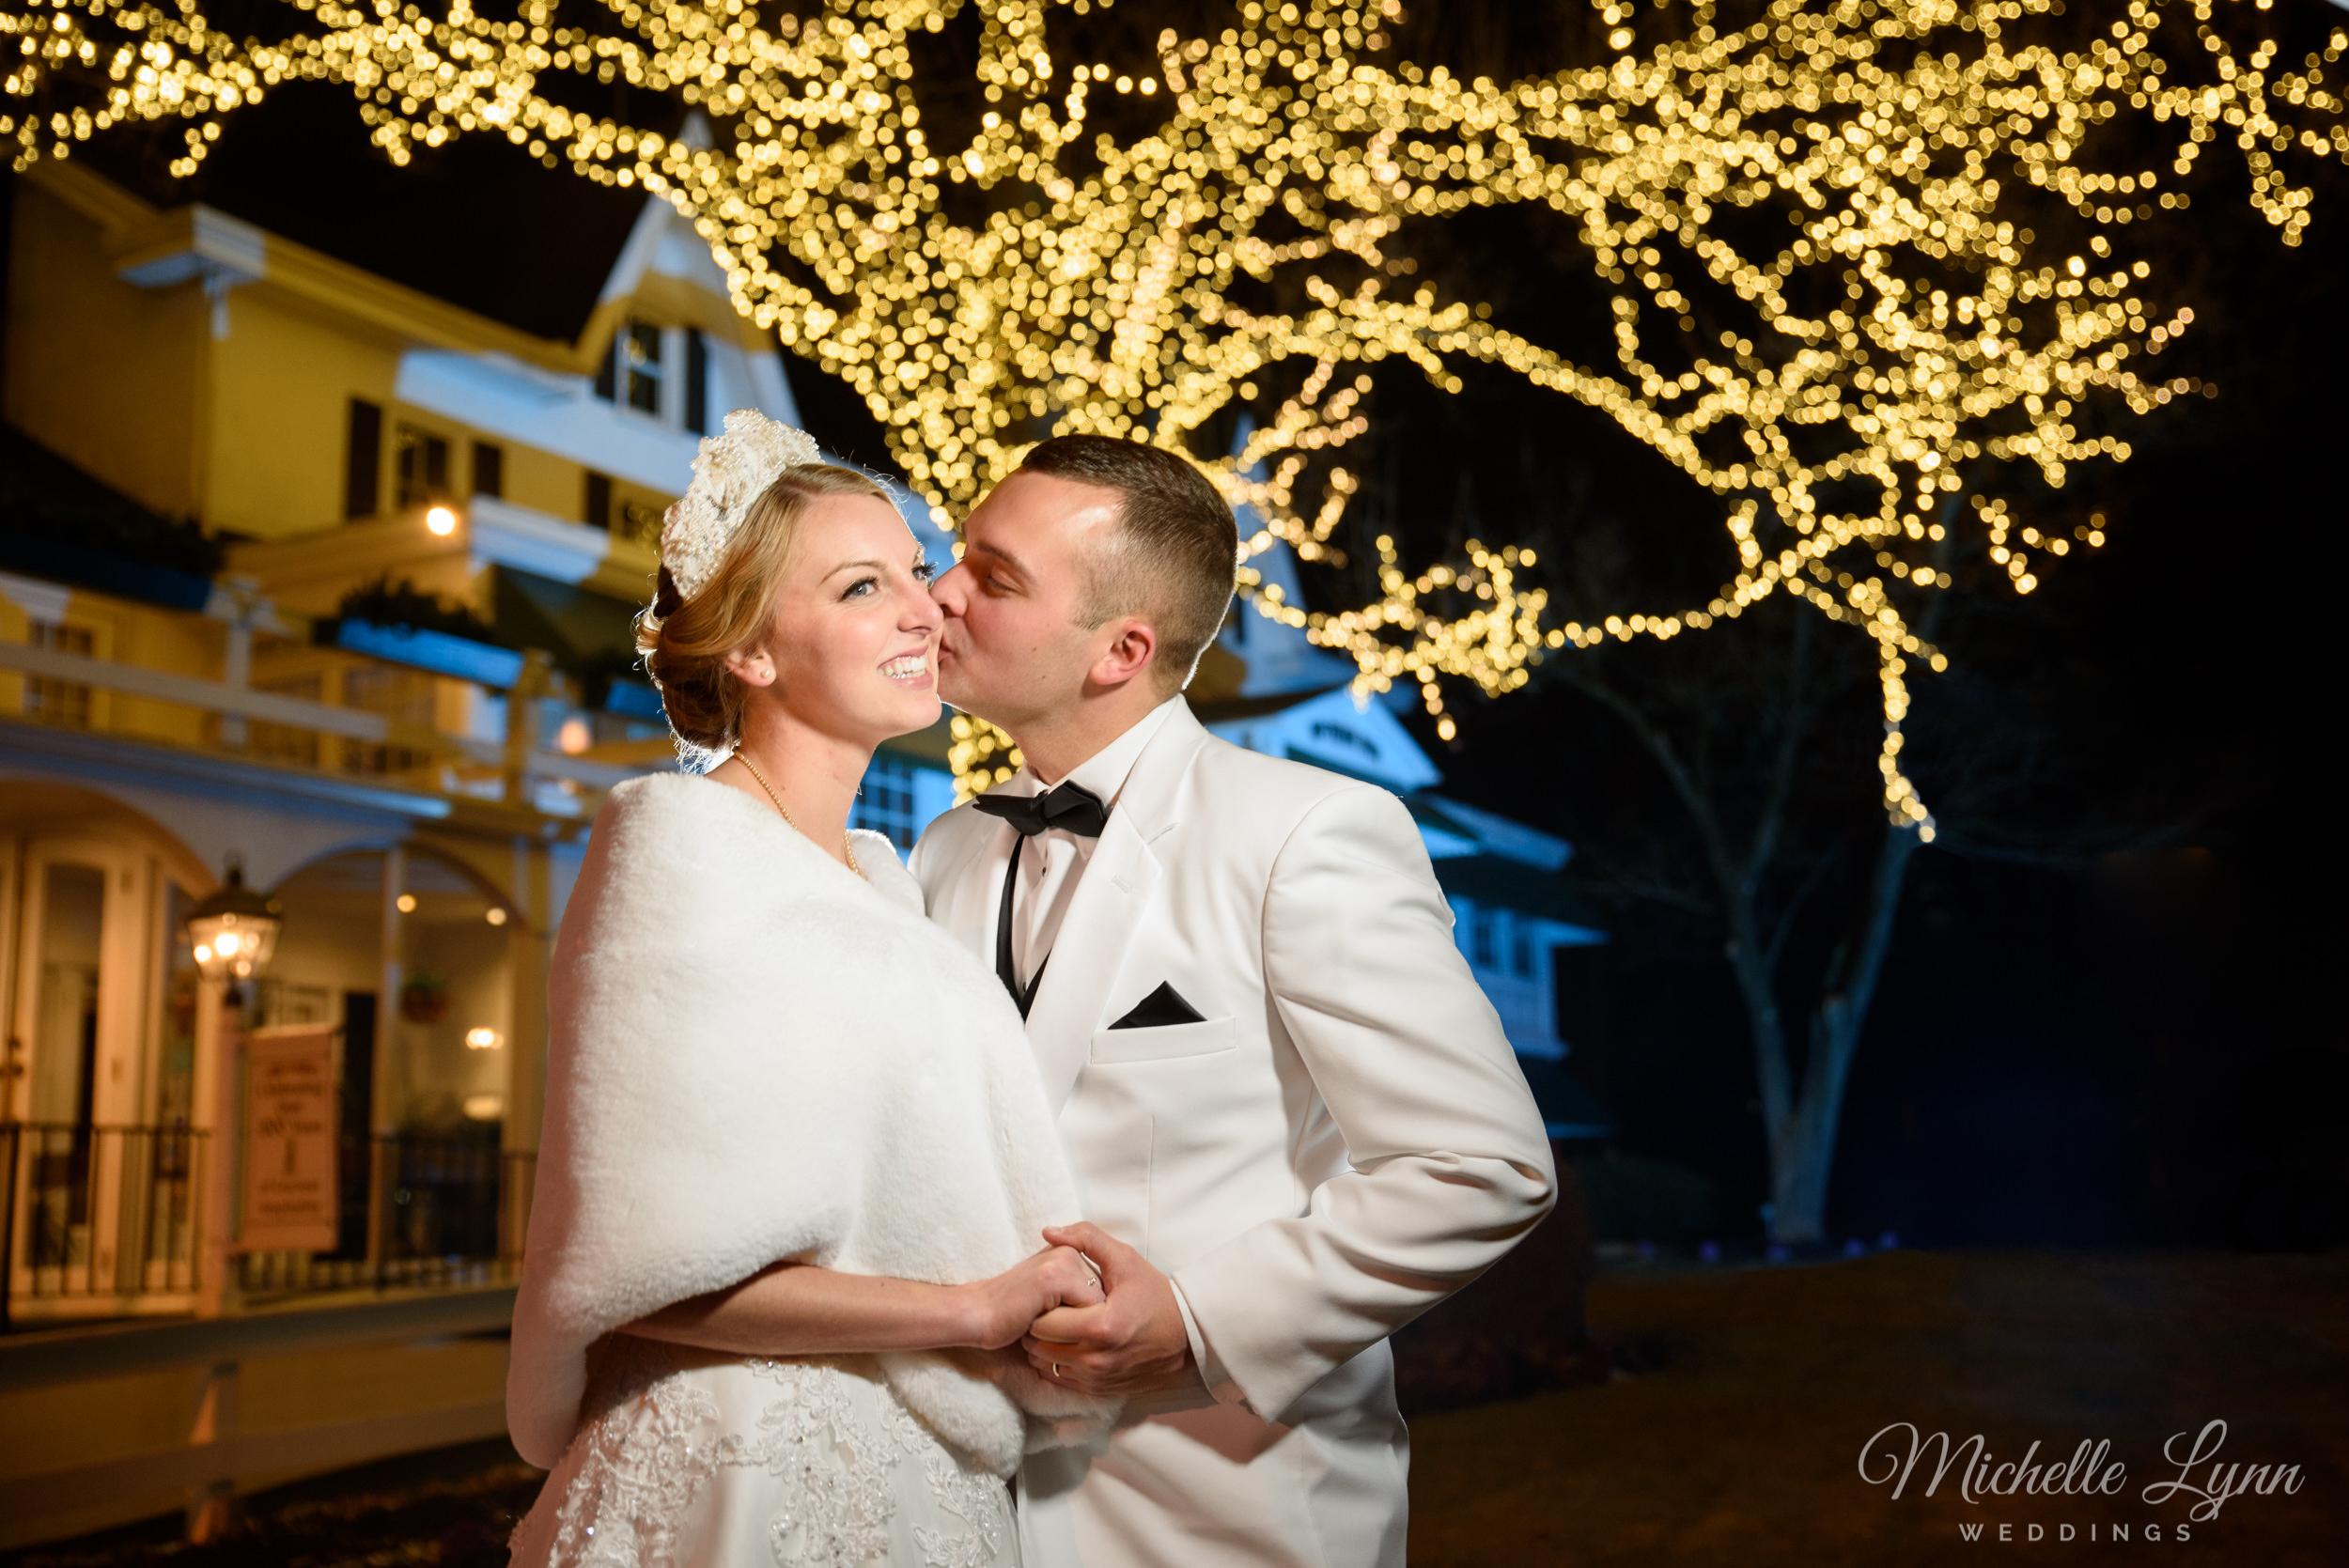 william-penn-inn-wedding-photography-mlw-125.jpg